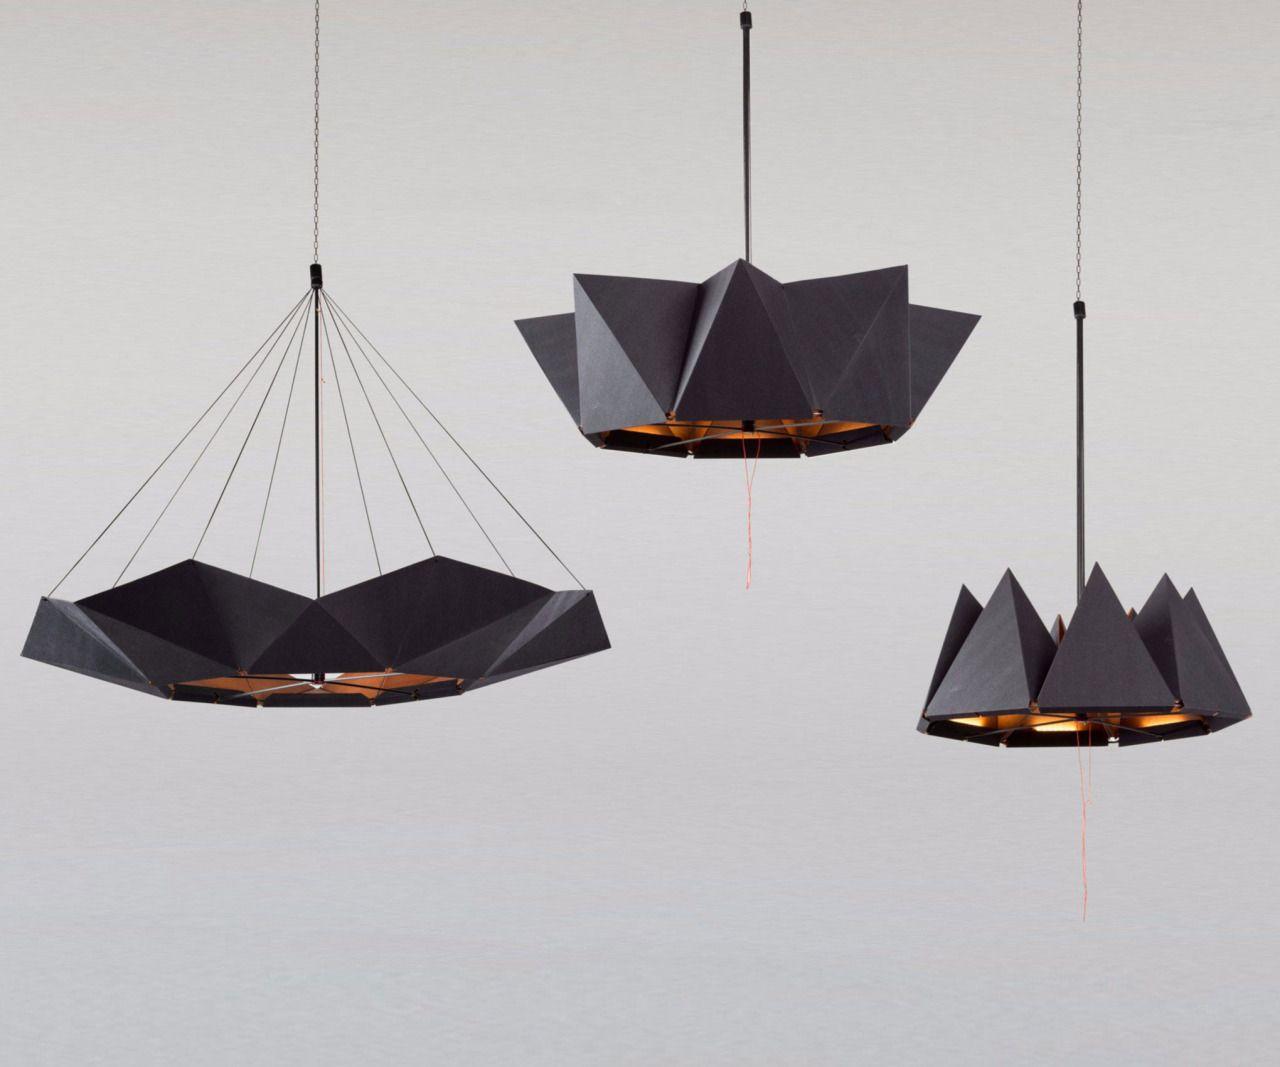 handmade lighting design. Archiproducts Design Awards Best Of Category _LIGHTING_LED Handmade Pendant Lamp InMOOV By Studio Lieven Nina Lighting